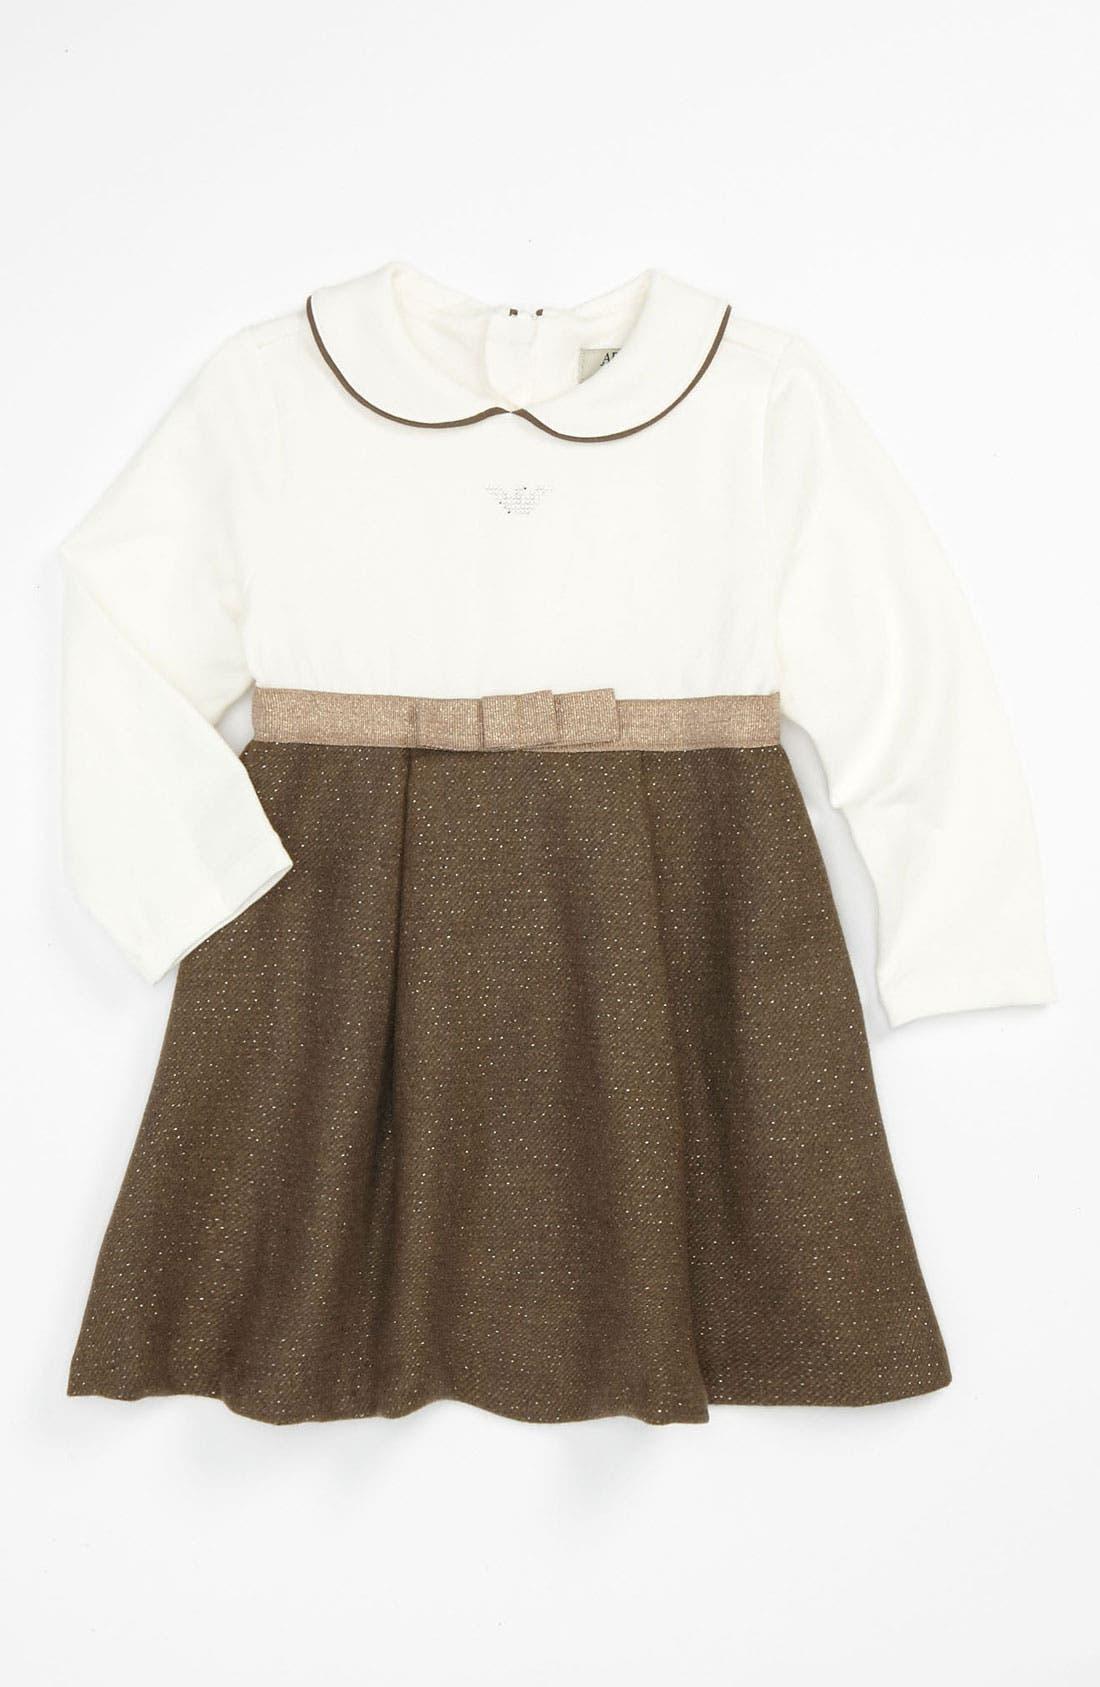 Alternate Image 1 Selected - Armani Junior Empire Waist Dress (Infant)